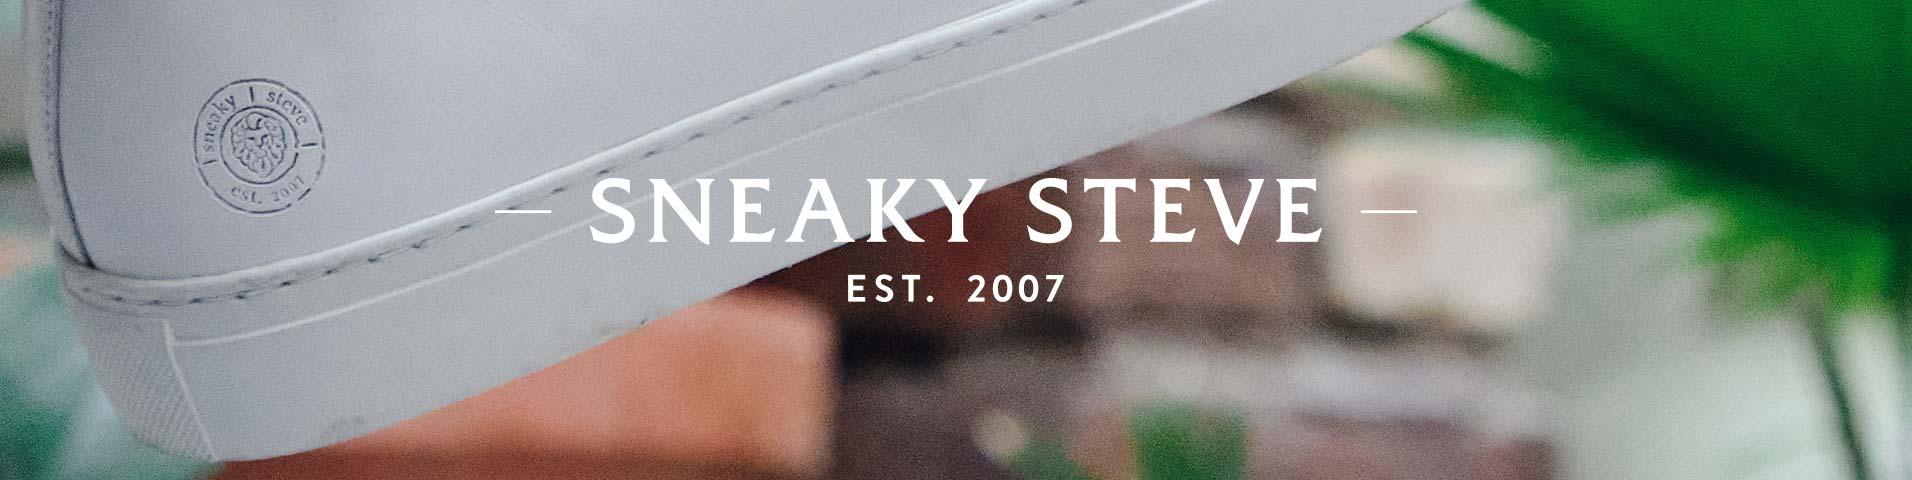 Bruna Sneaky Steve Skor & kläder online. Alltid Fri Frakt